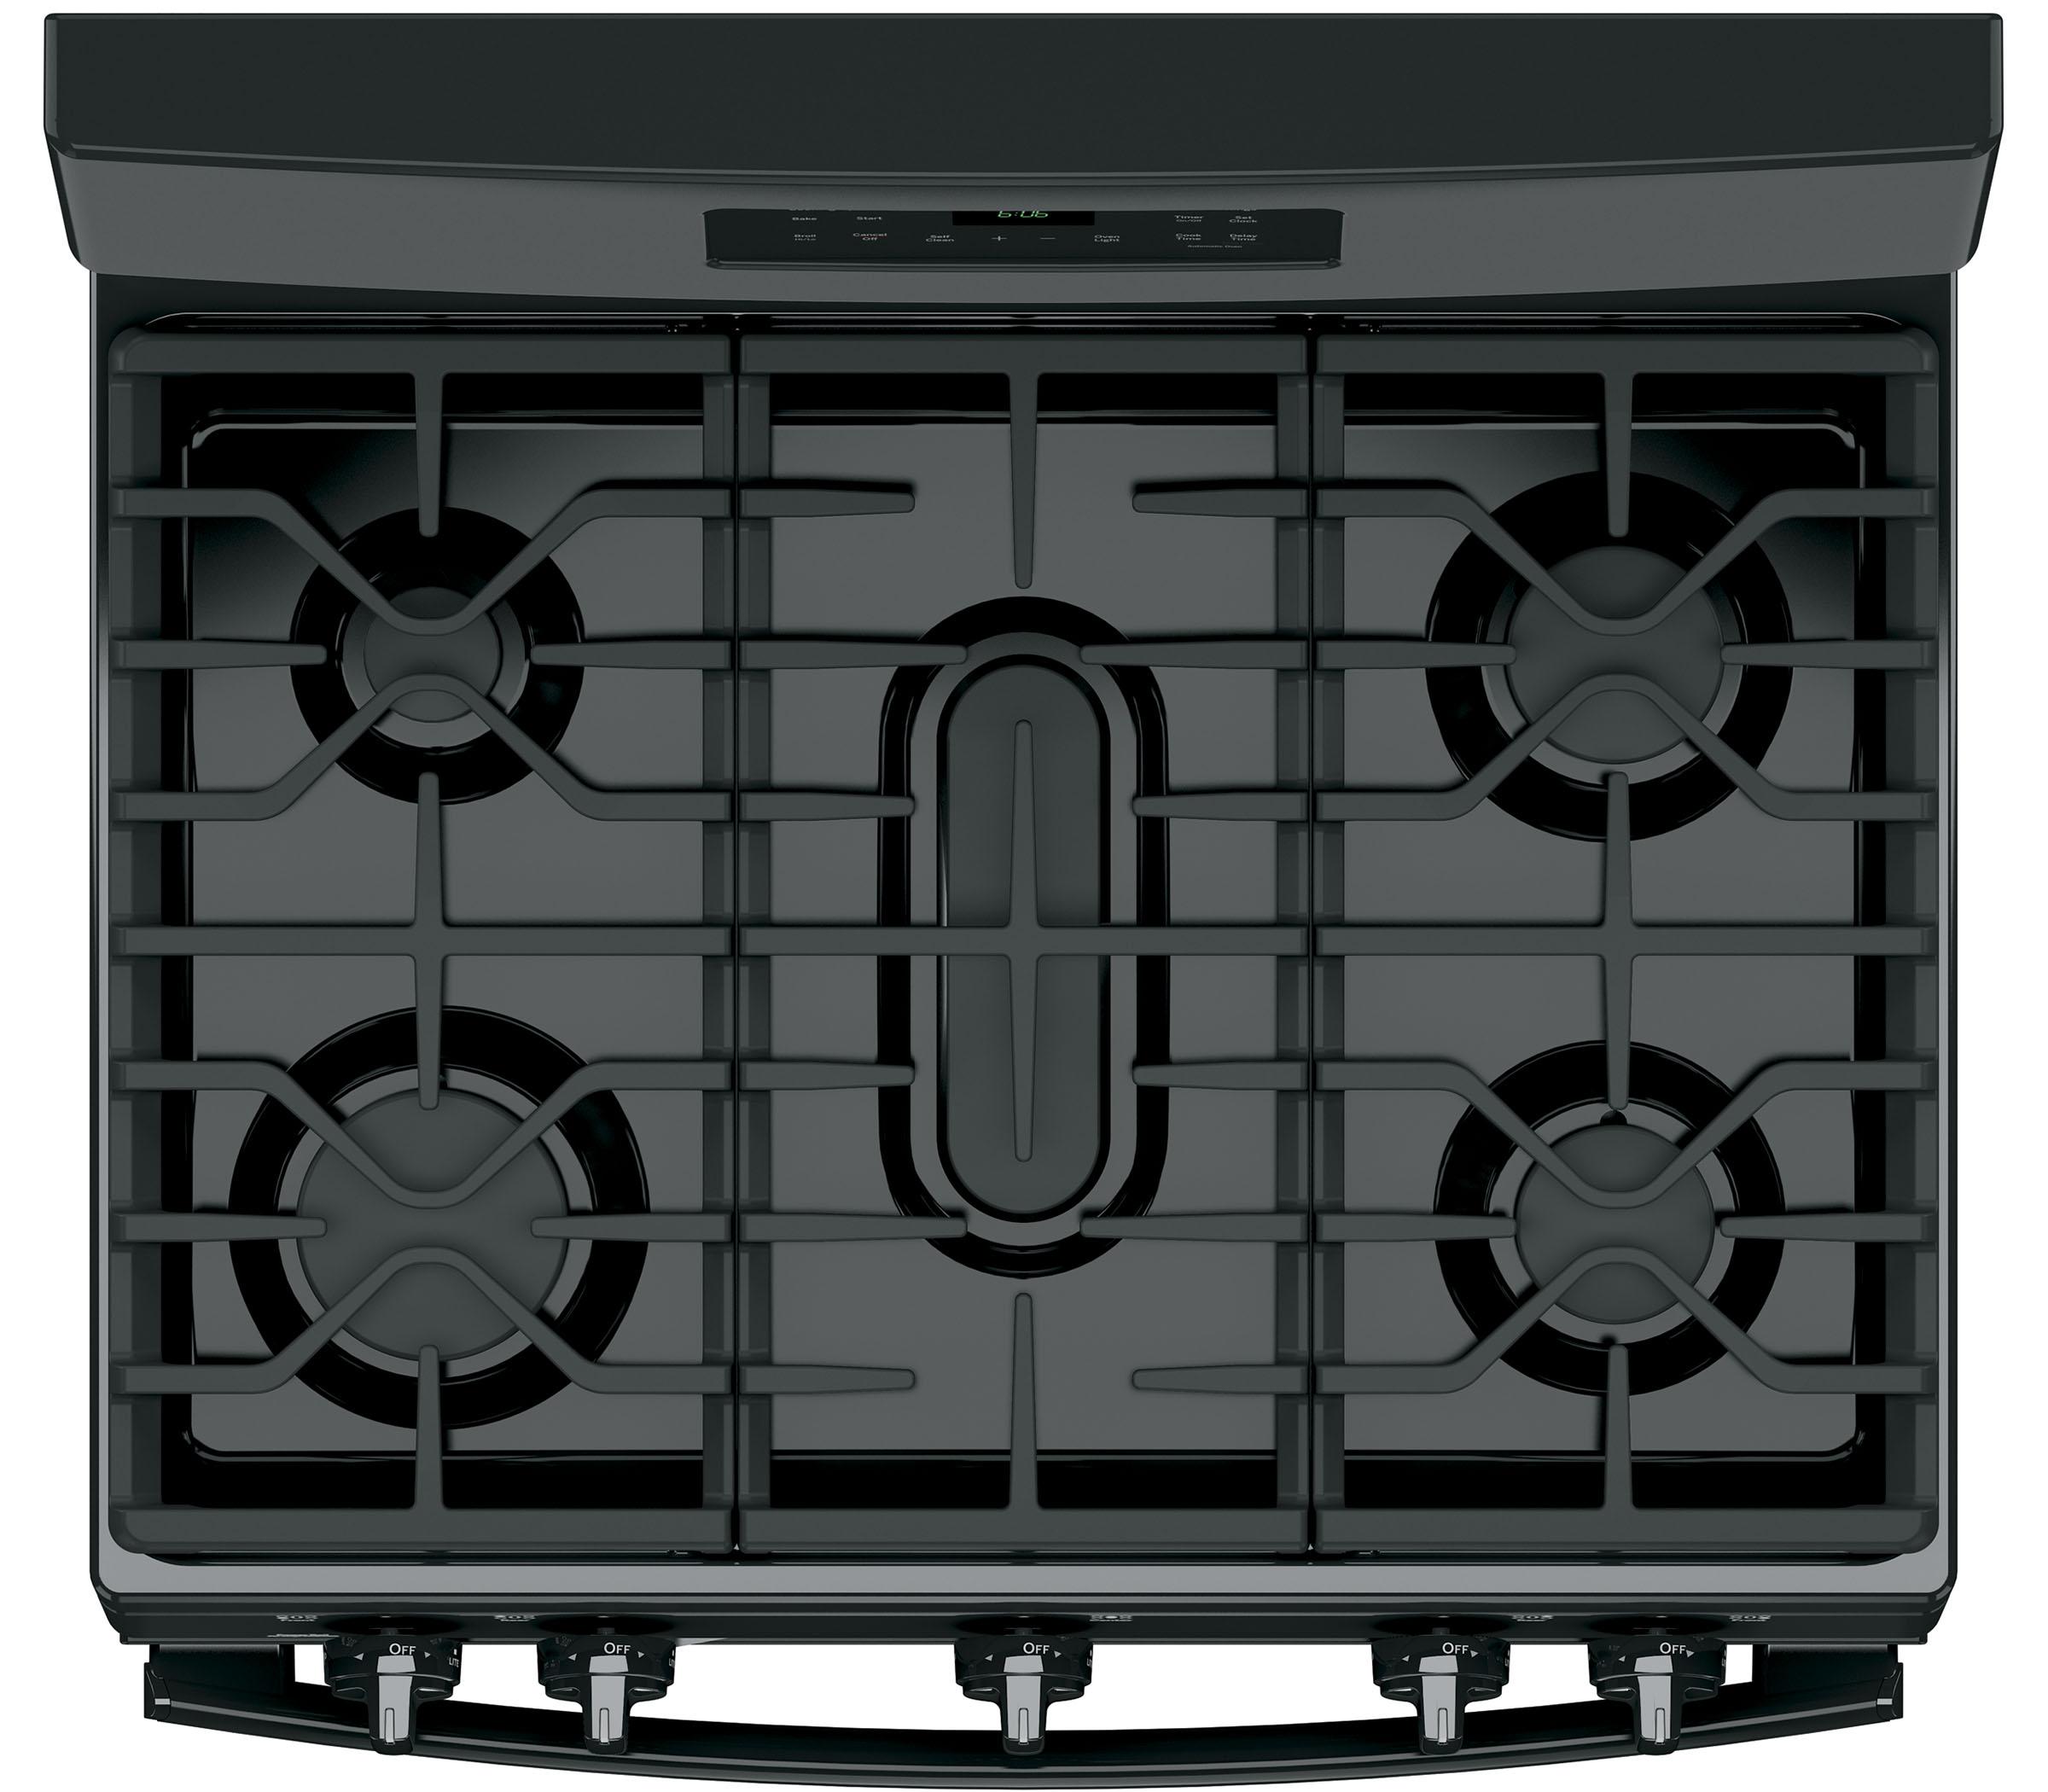 GE Appliances JGB660DEJBB 5.0 cu .ft. Freestanding Gas Range - Black